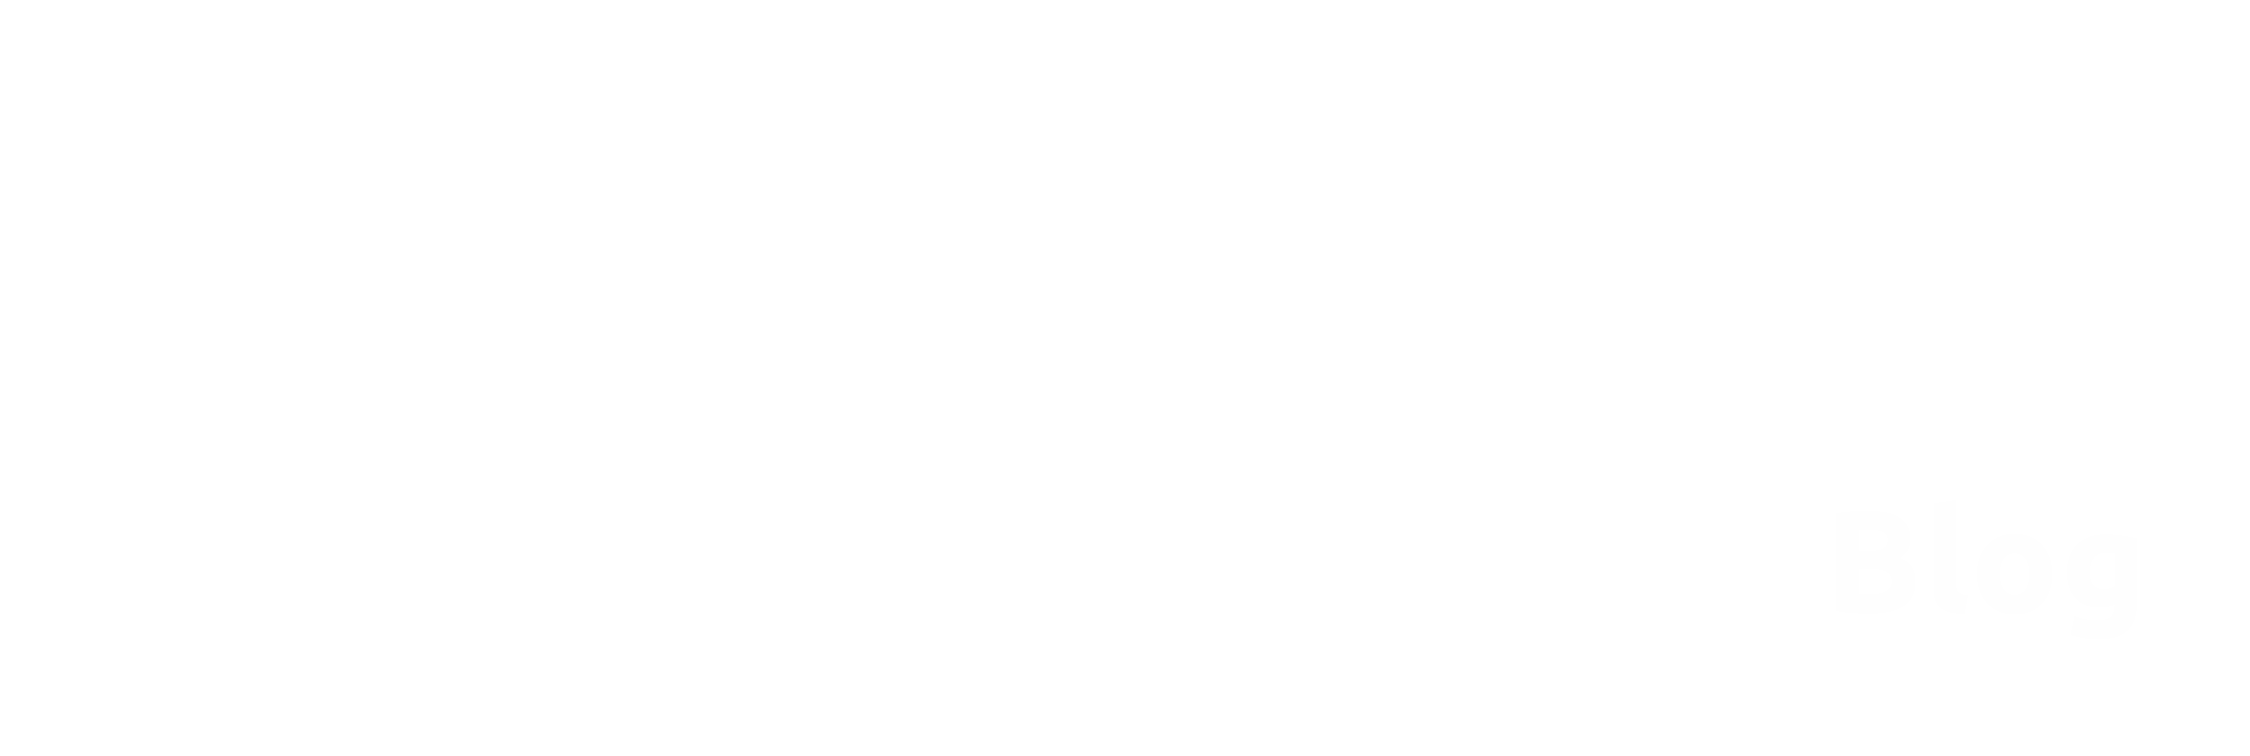 Blog iMedicina – Software Gratuito para Consultórios